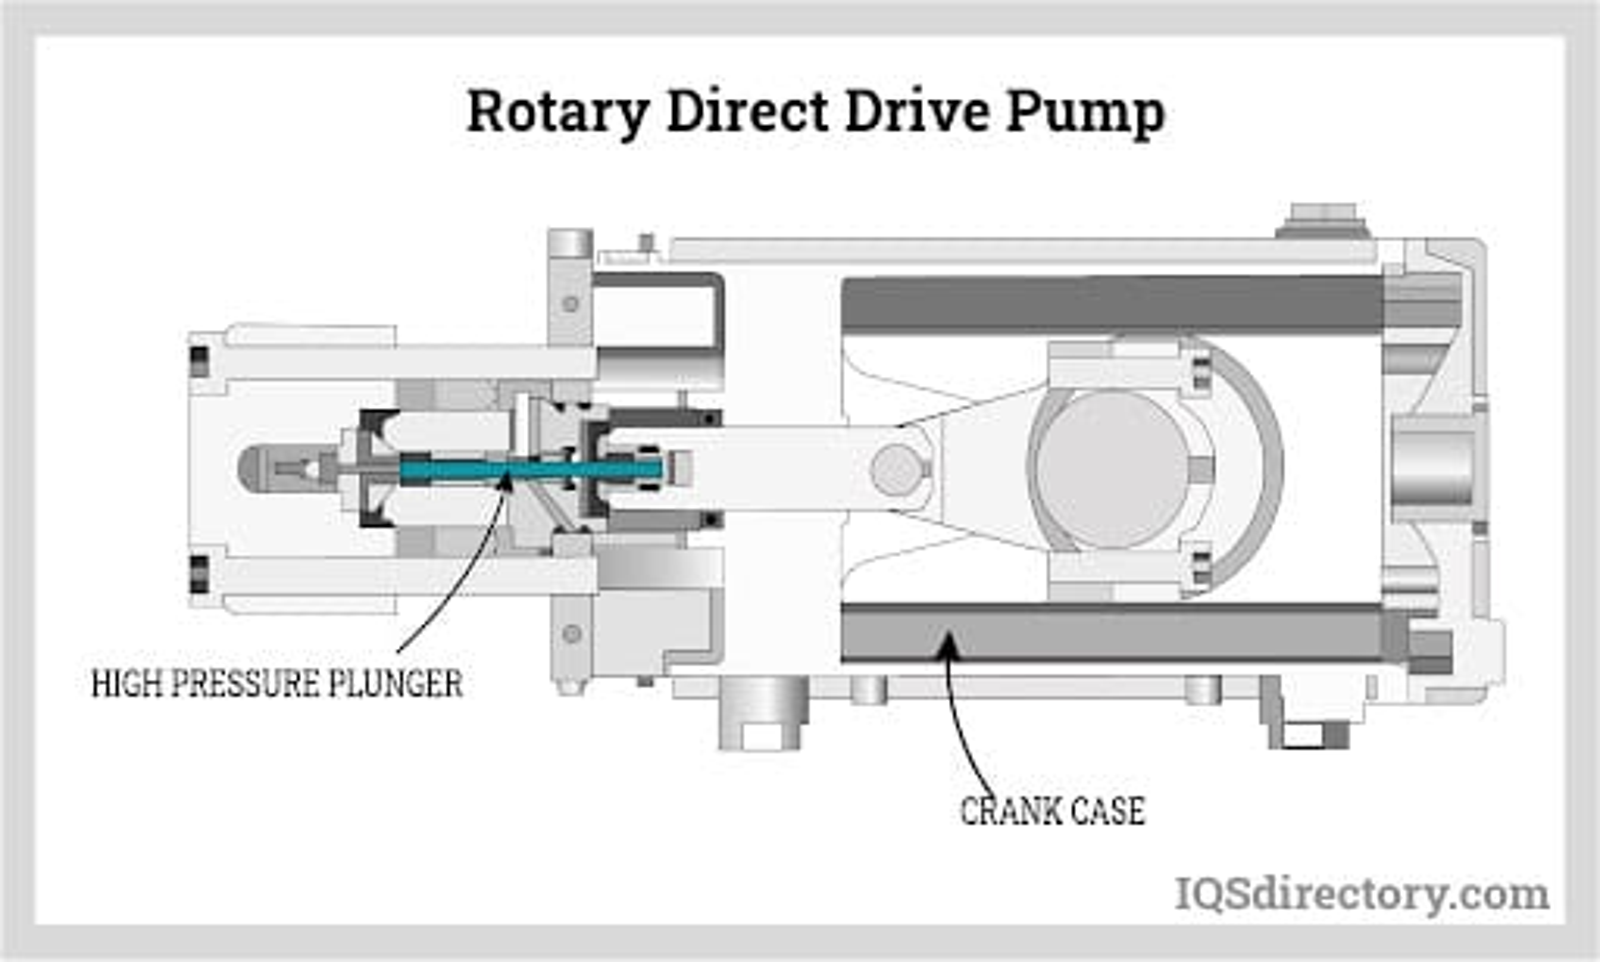 Rotary Direct Drive Pump